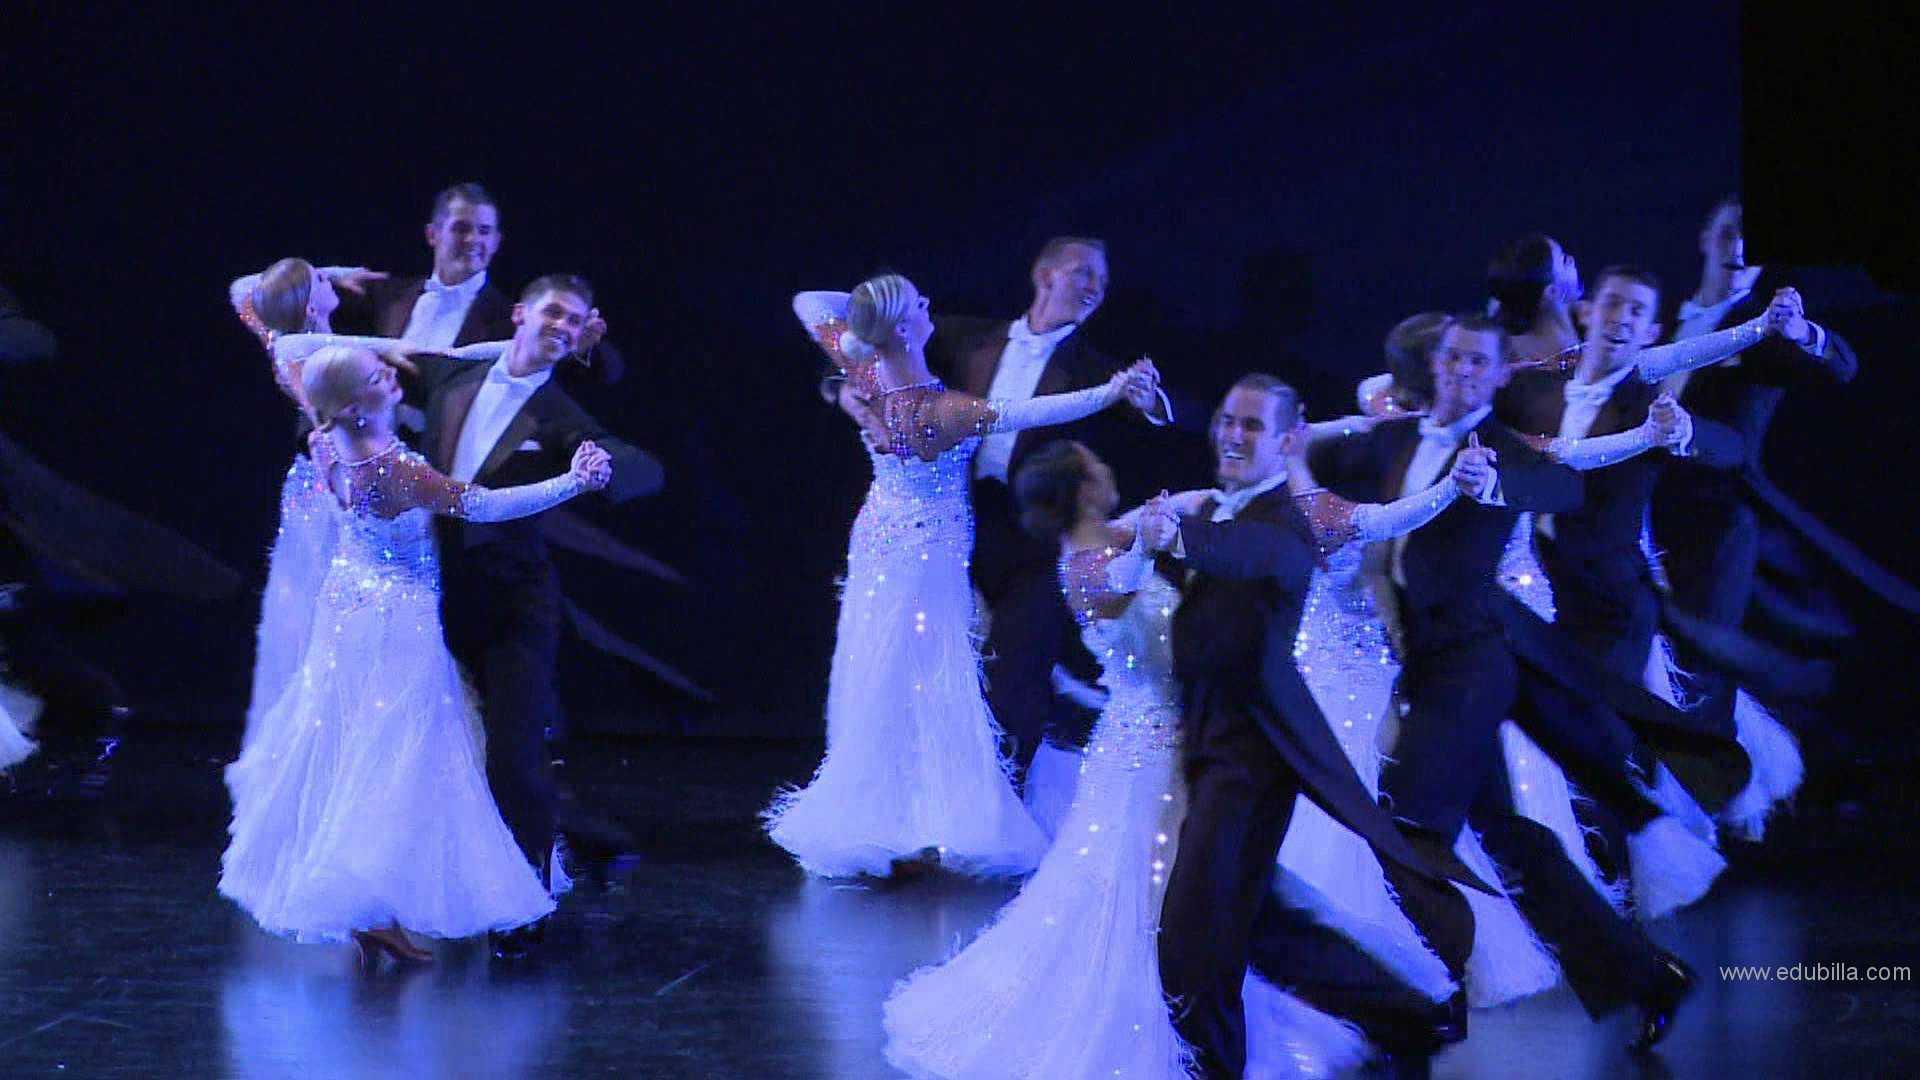 ballroomdance22.jpg